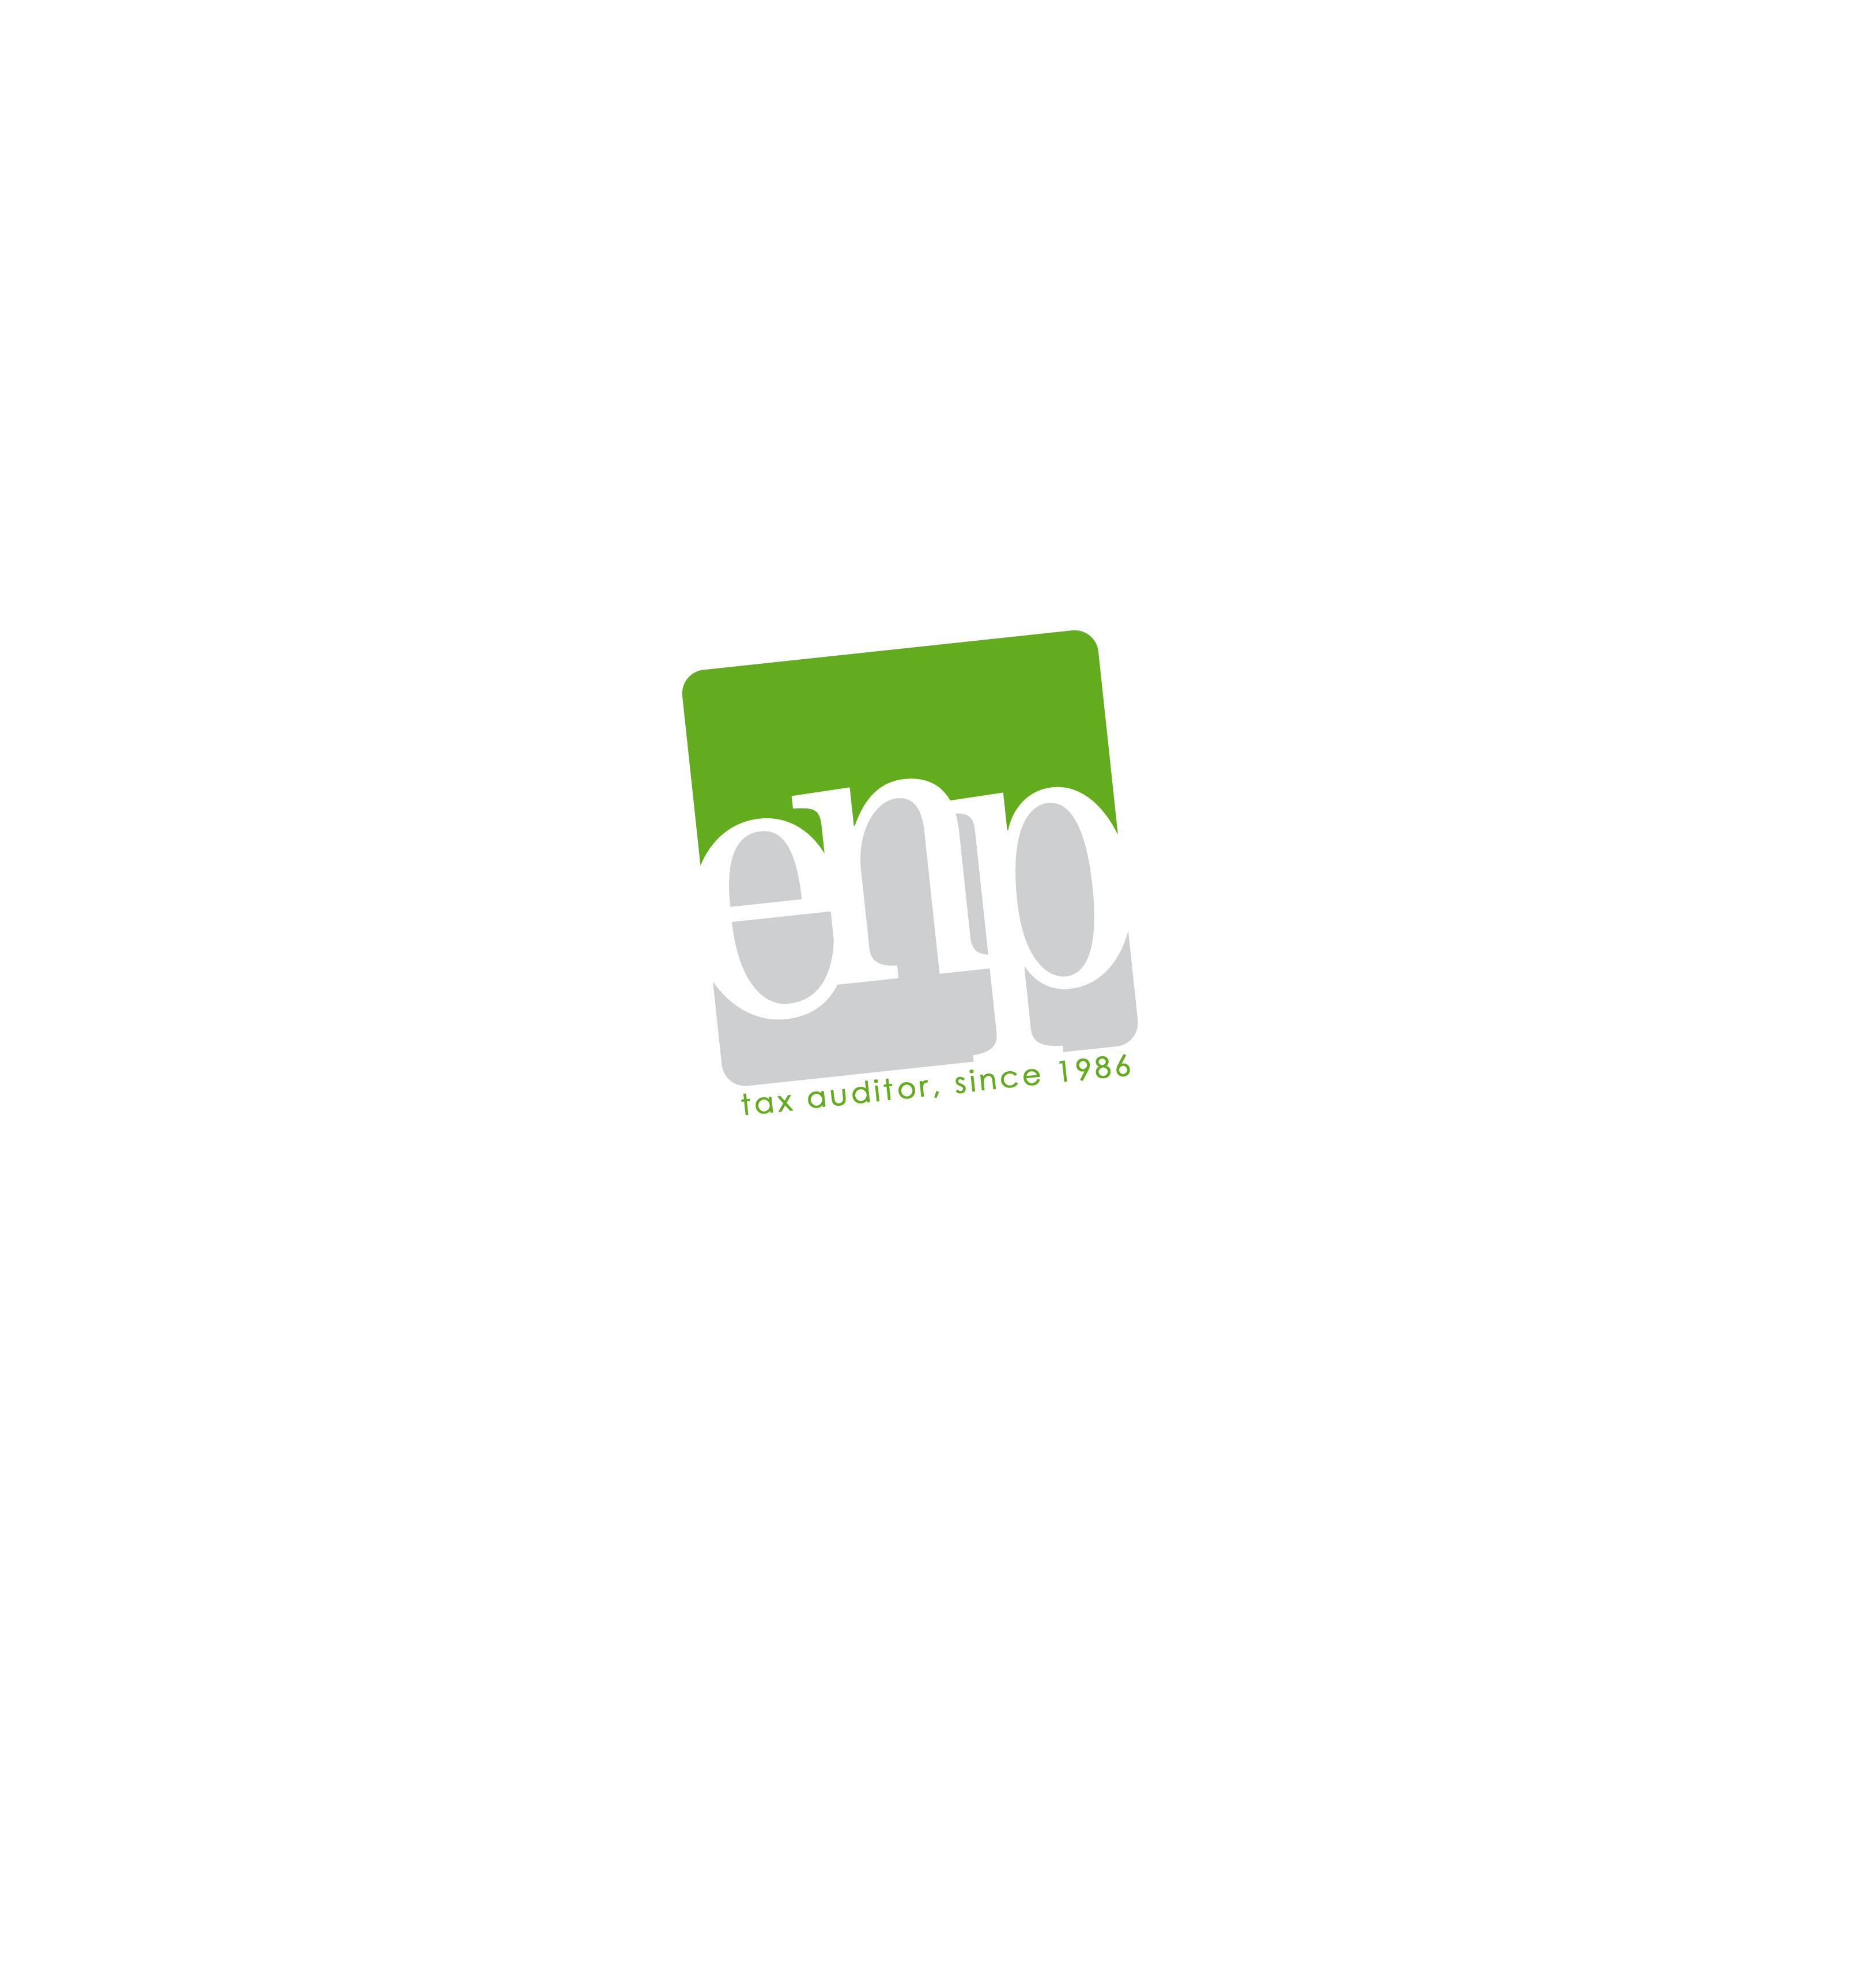 ENP_BANNER_LOGO_MASTER_BRIZ4